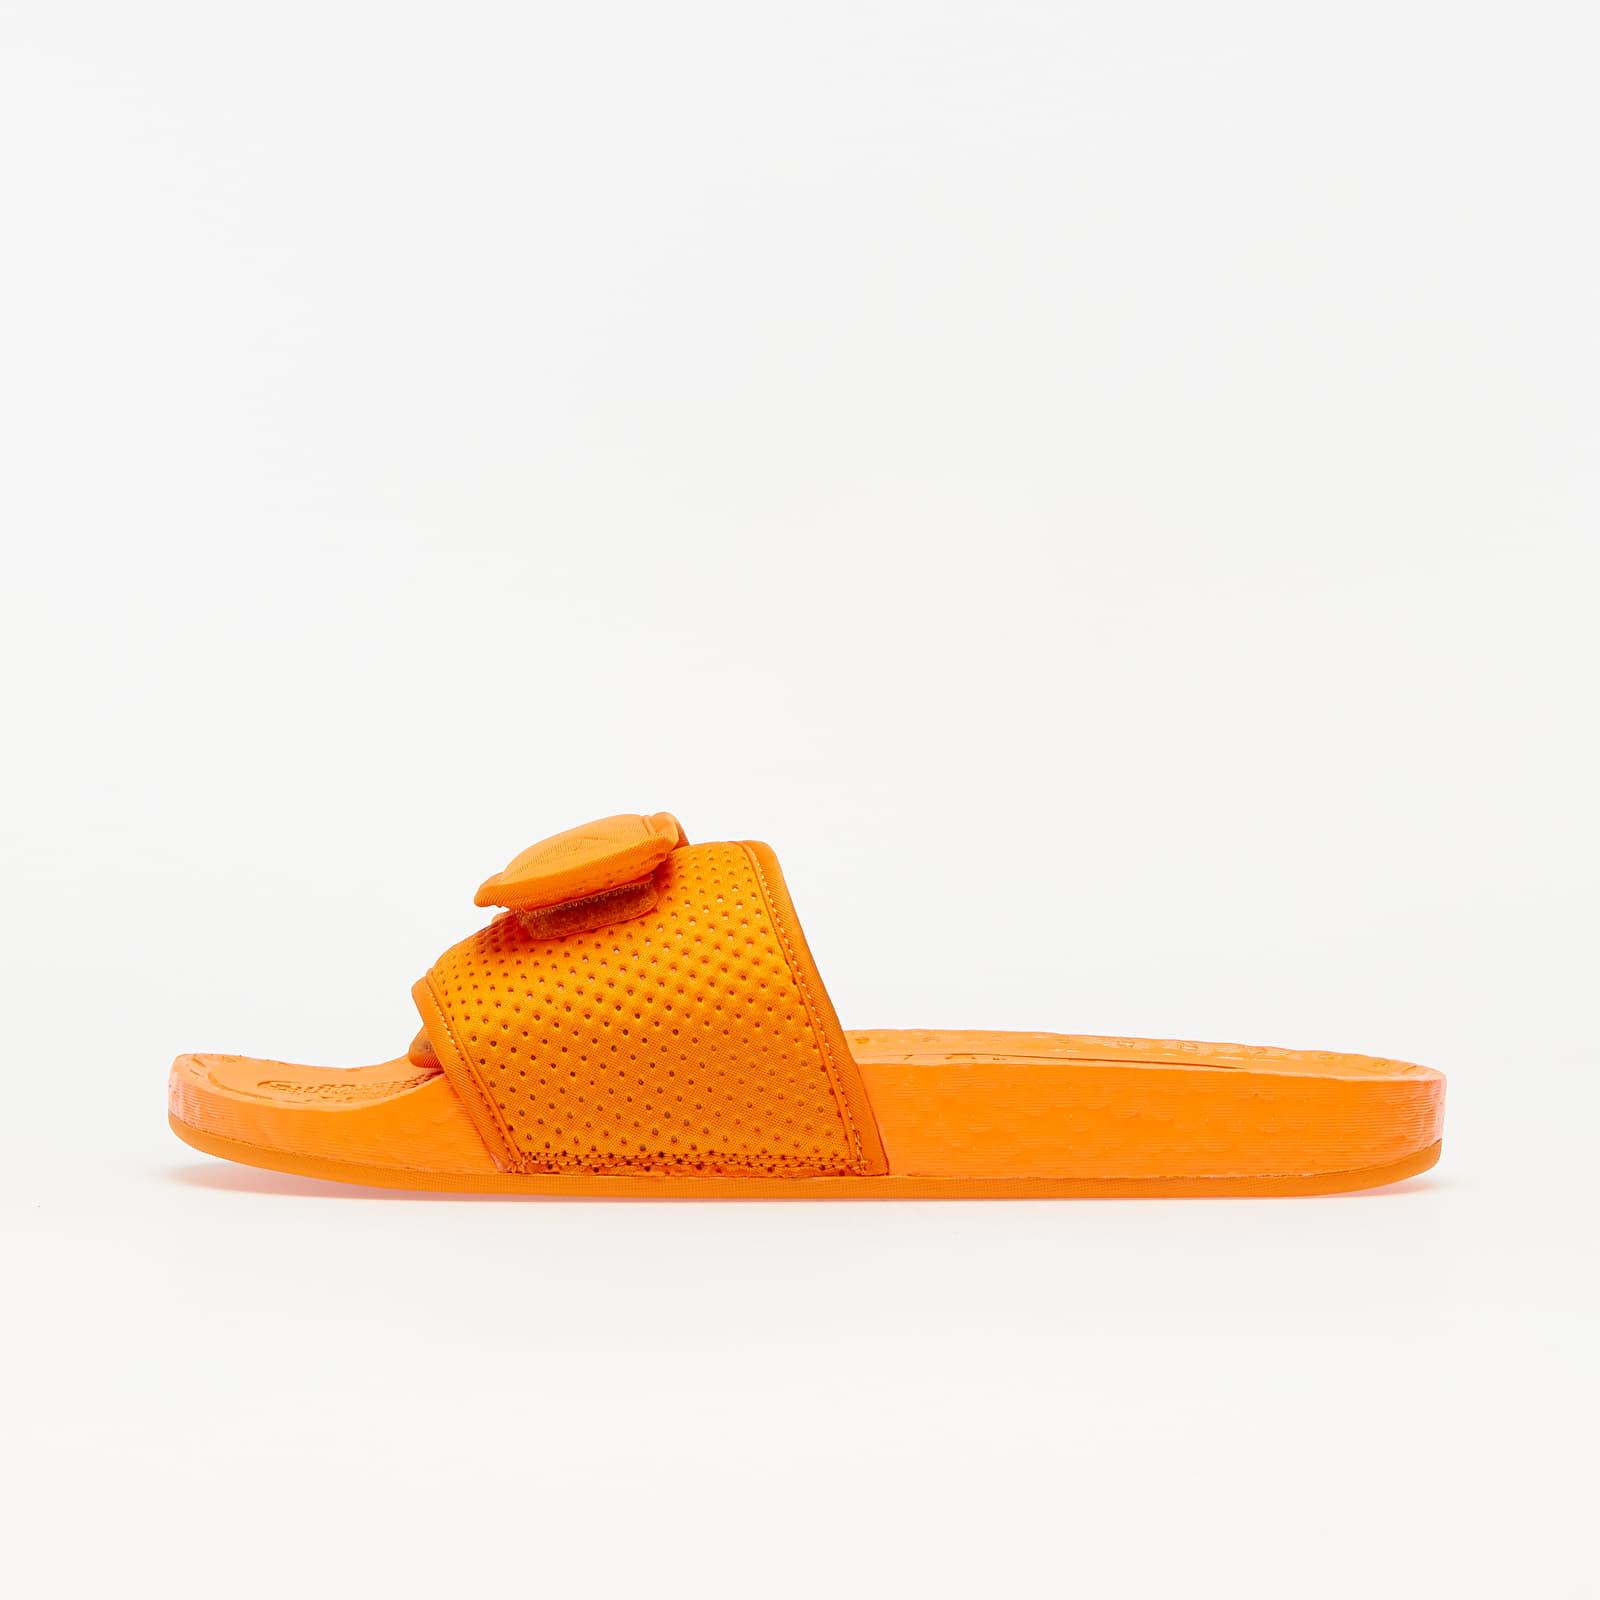 adidas x Pharrell Williams Chancletas HU Bright Orange/ Bright Orange/ Bright Orange FV7261